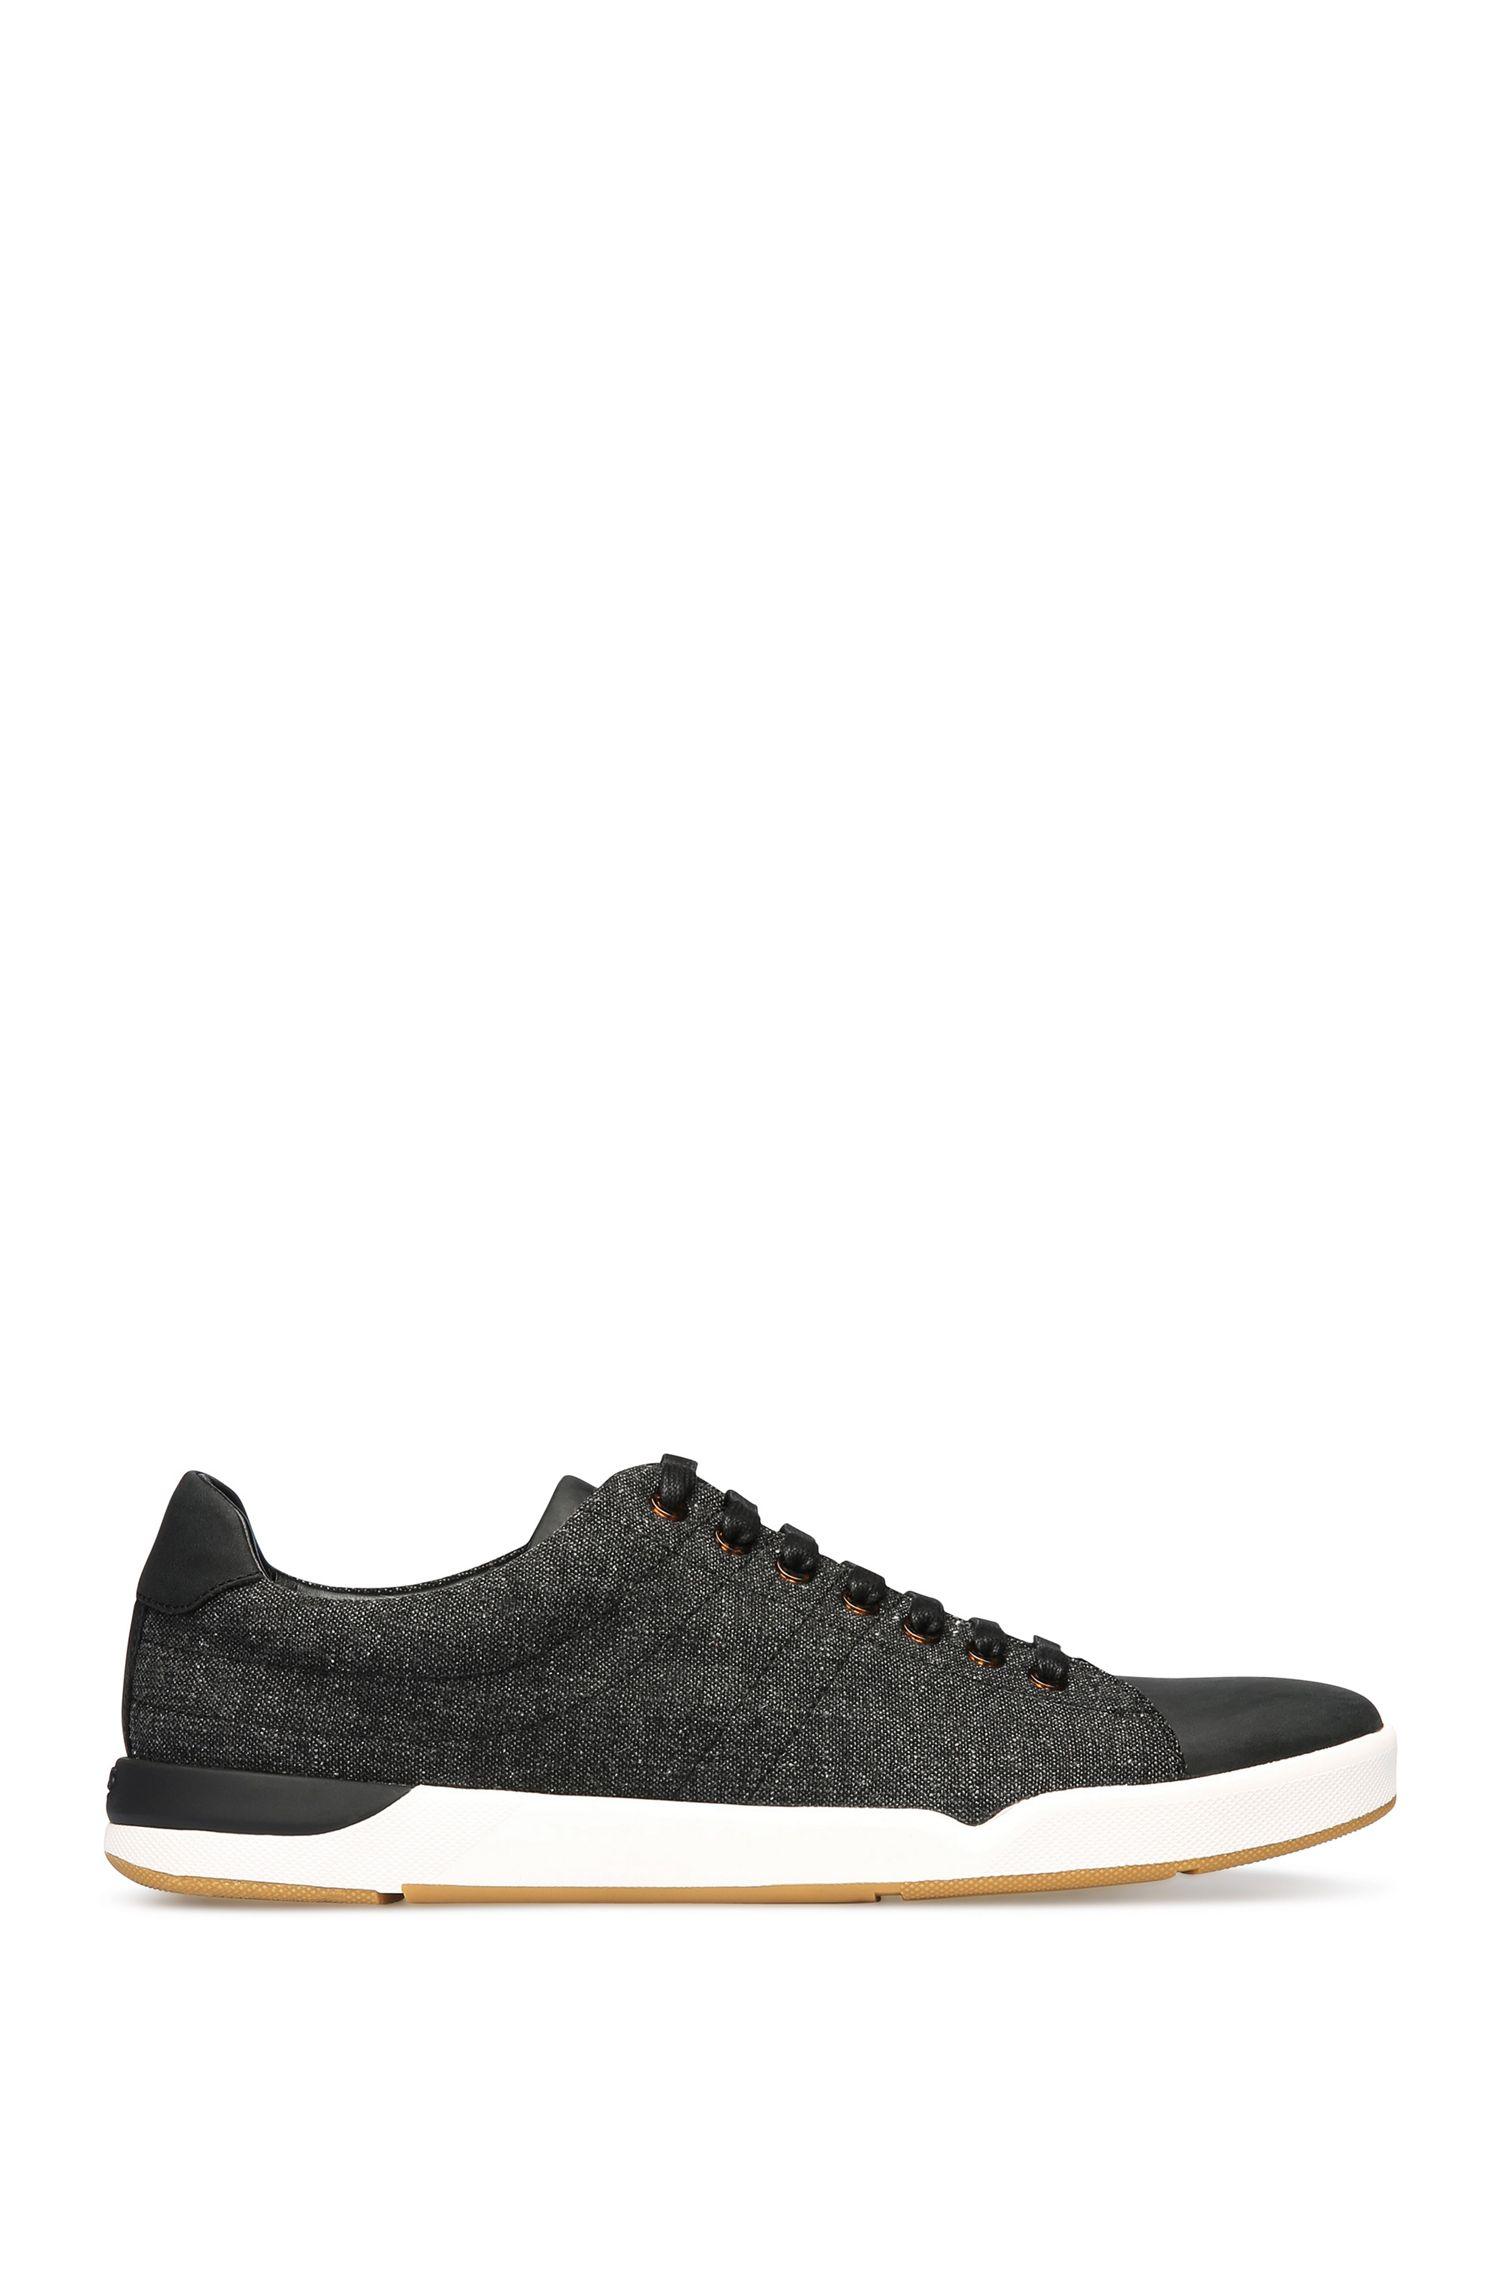 'Stillness Tenn Tw' | Tweed Leather Sneakers